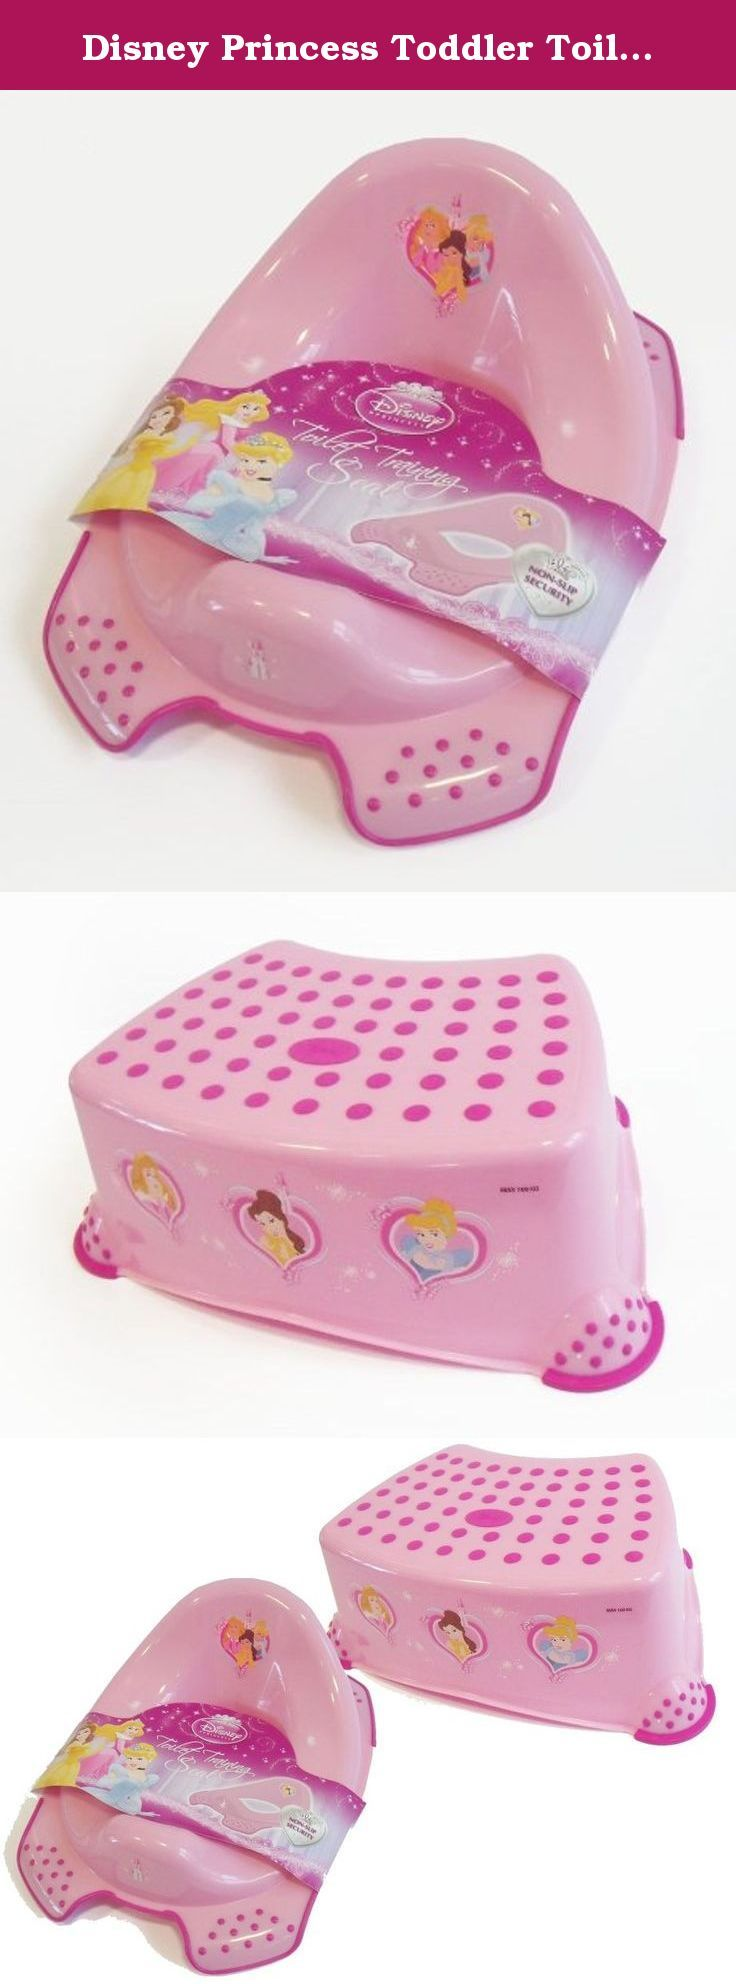 Disney Princess Toddler Toilet Training Seat \u0026 Step Stool Combo - Pink. Disney Princess Step & Disney Princess Toddler Toilet Training Seat \u0026 Step Stool Combo ... islam-shia.org